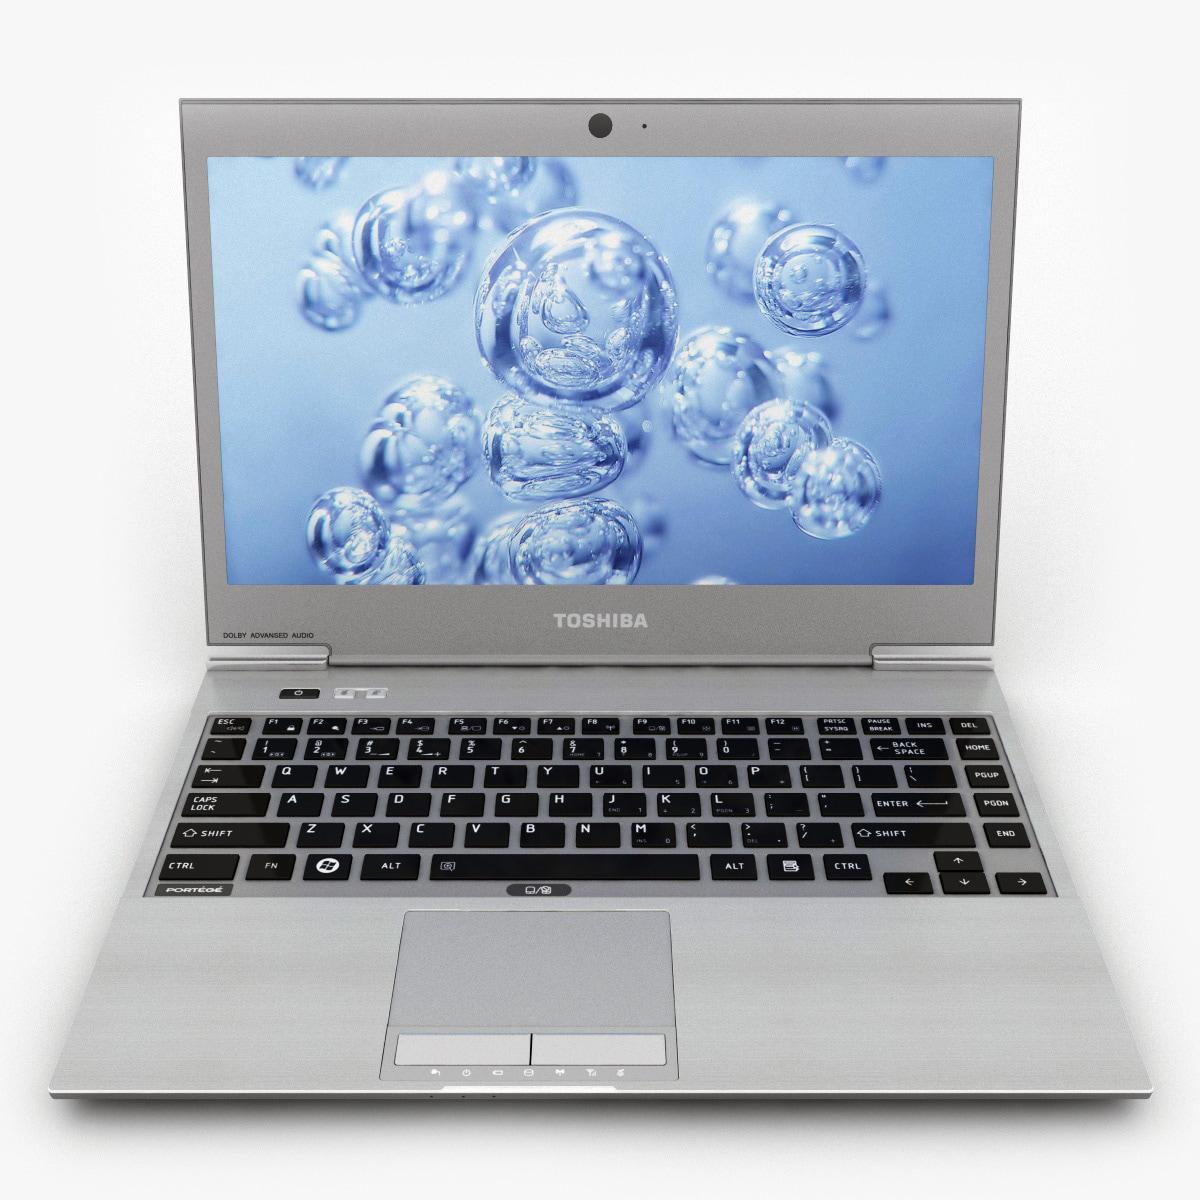 Laptop_Toshiba_Z830_00.jpg